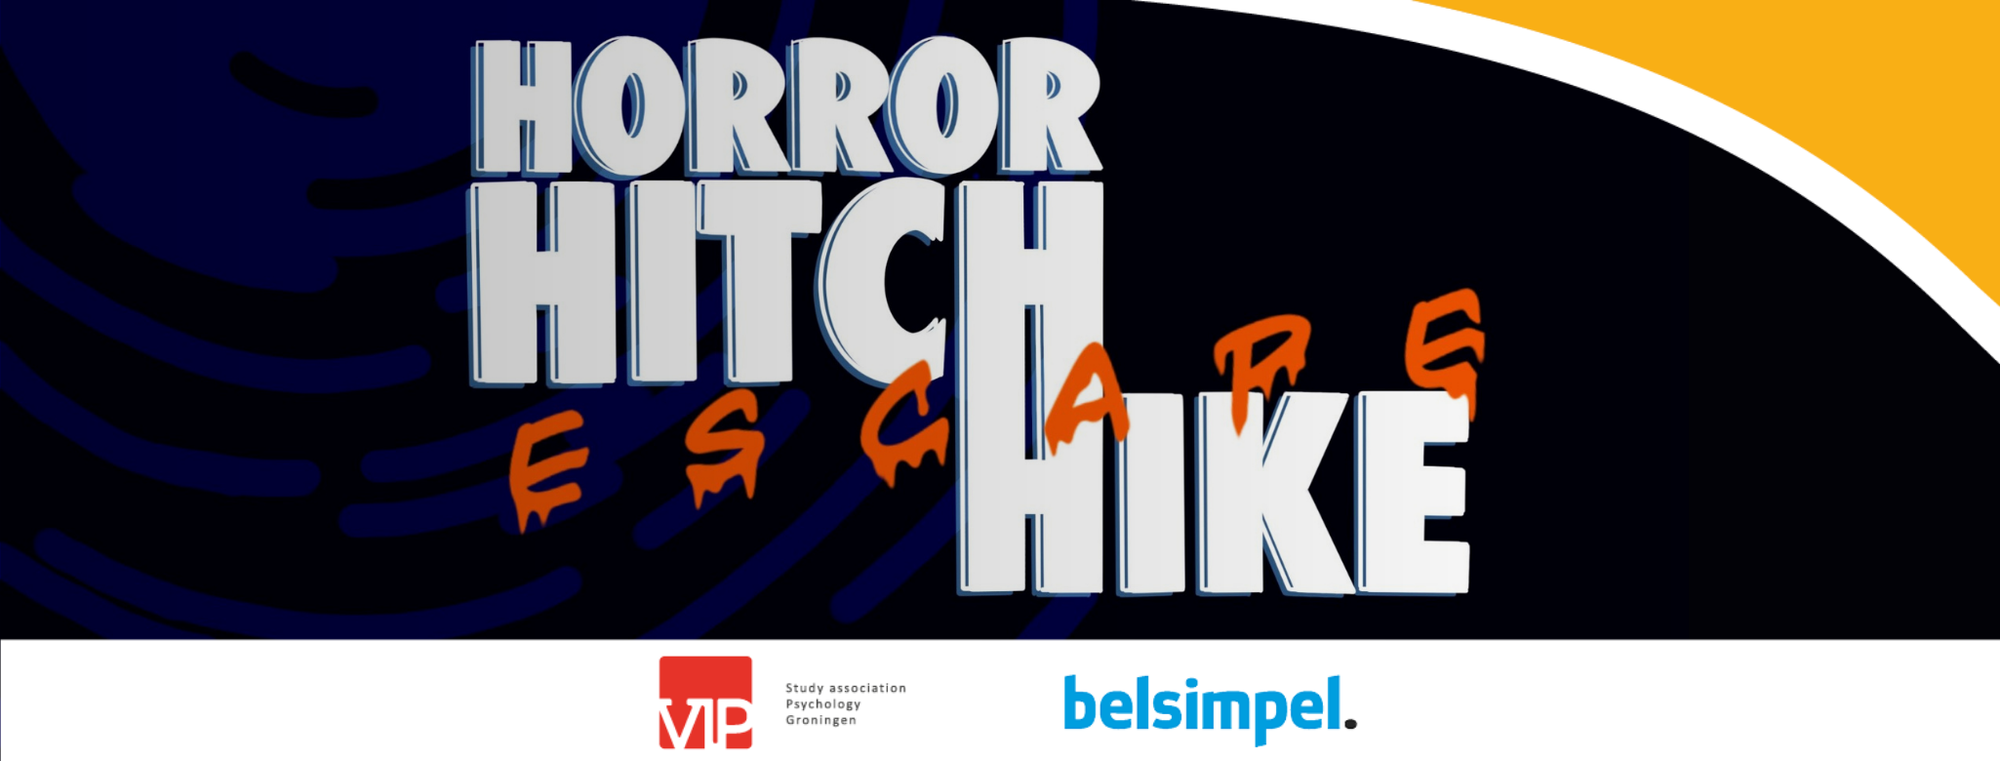 VIP: Horror Hitchhike Escape